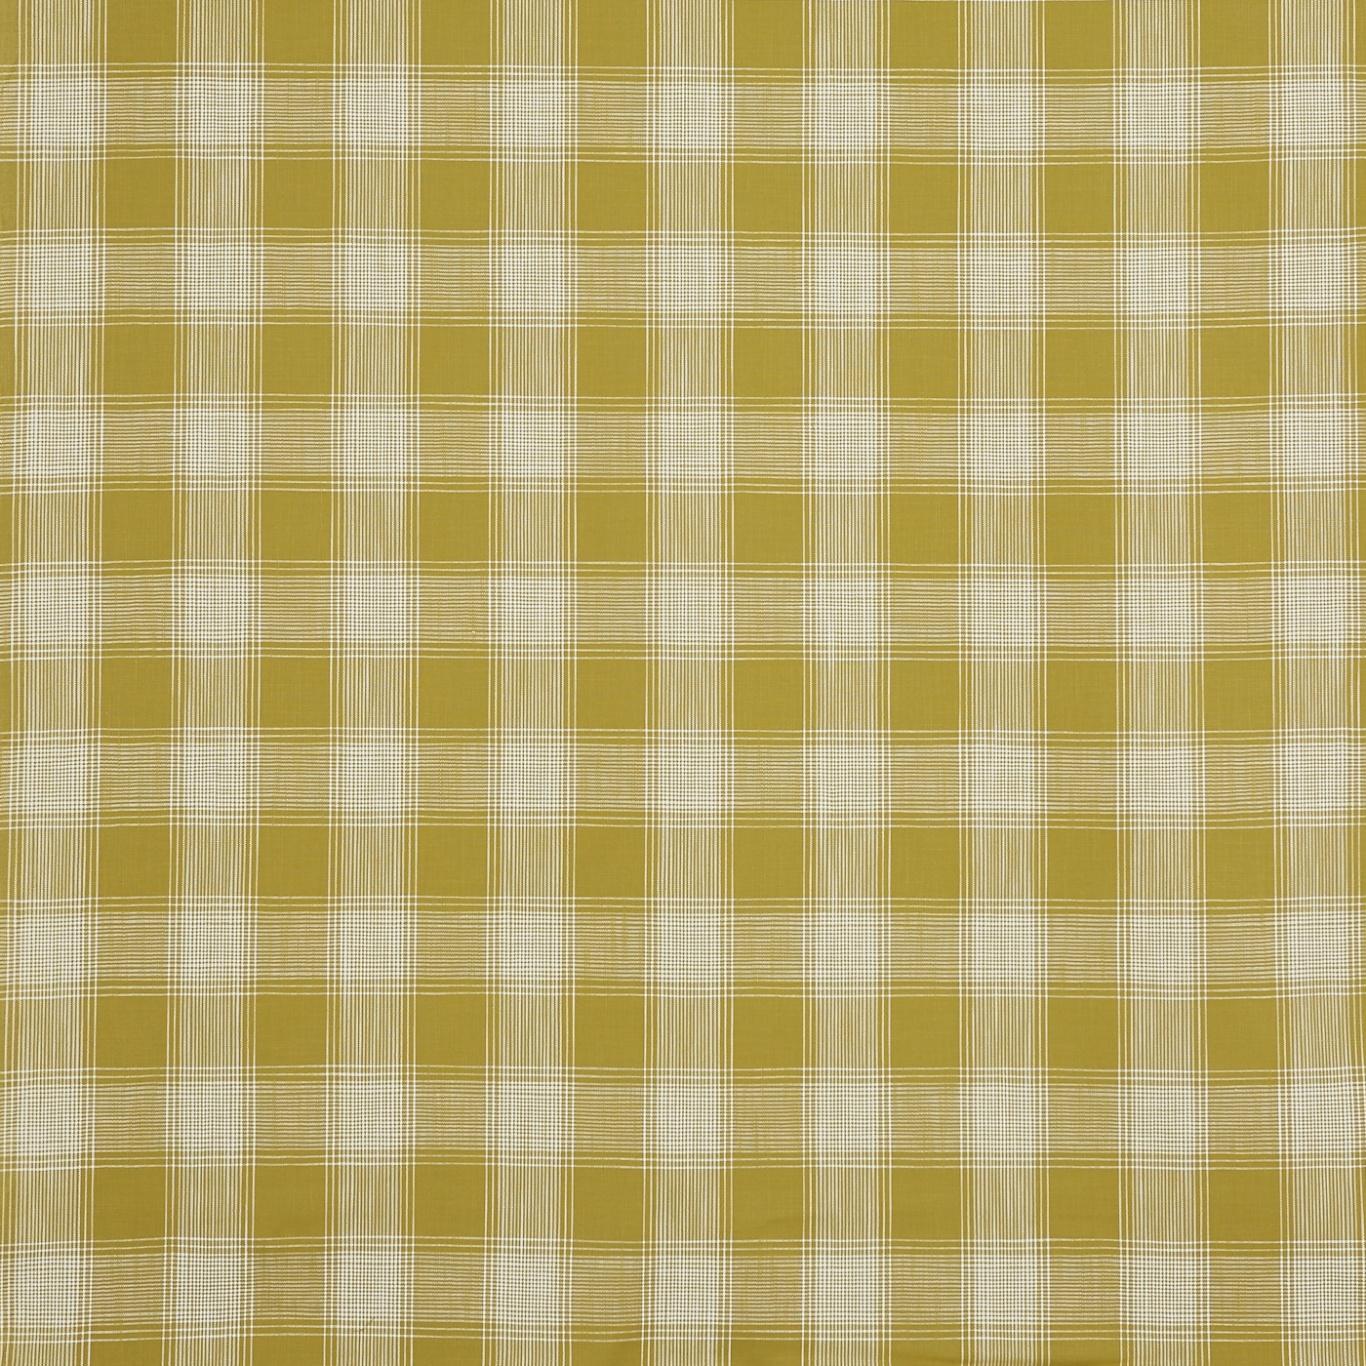 Image of Prestigious Portland Mimosa Fabric 3817/811